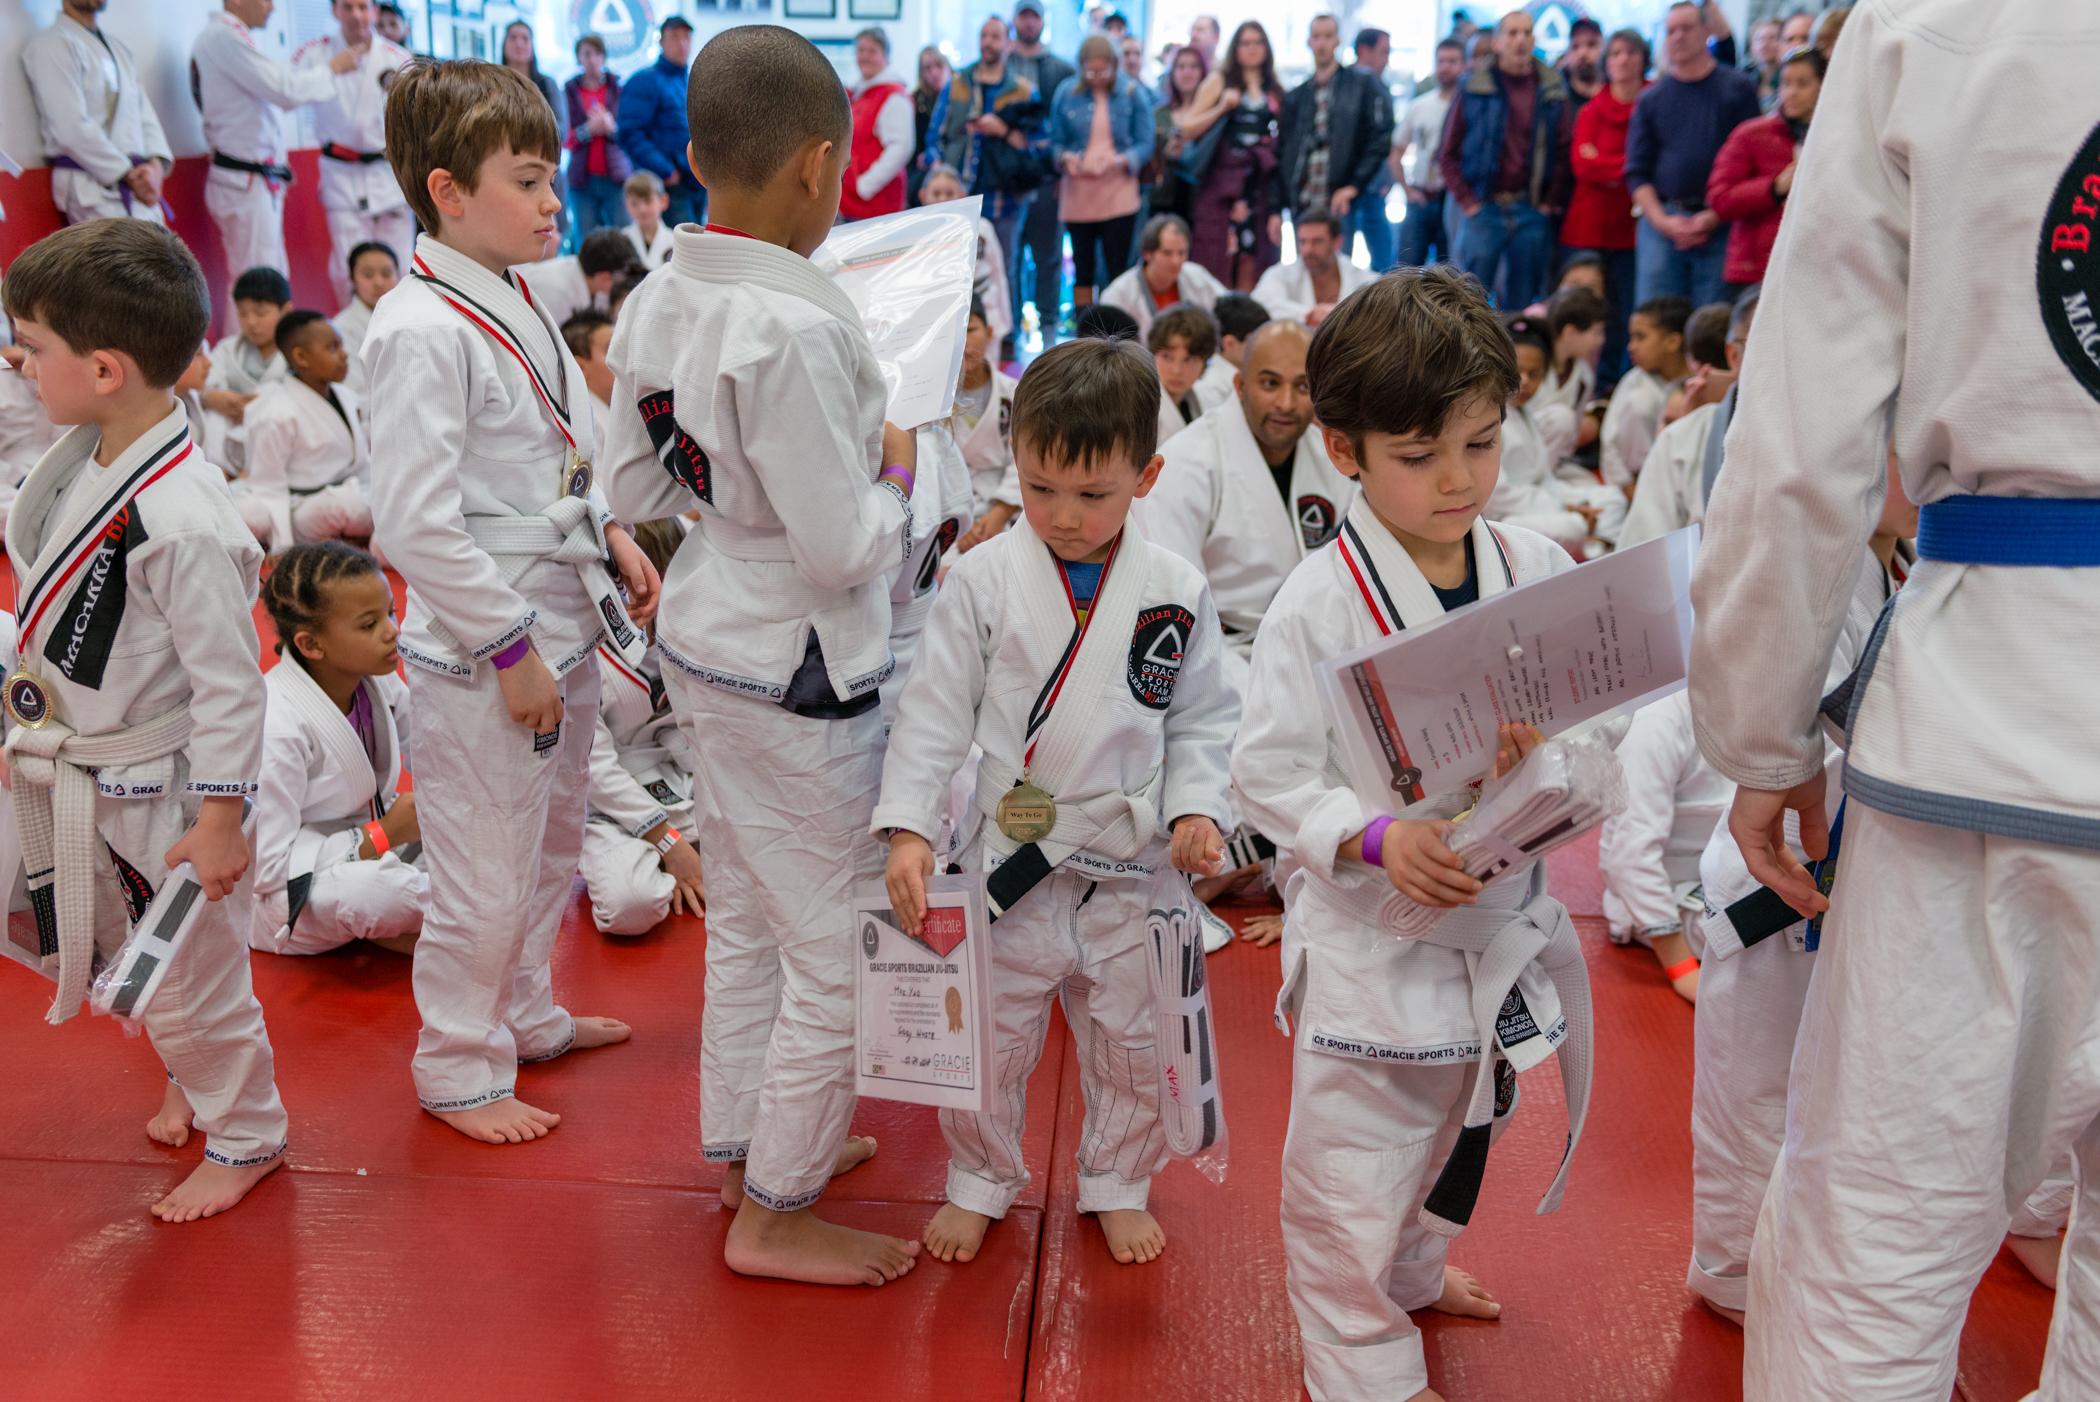 Gracie-Sports-Kids-76.jpg